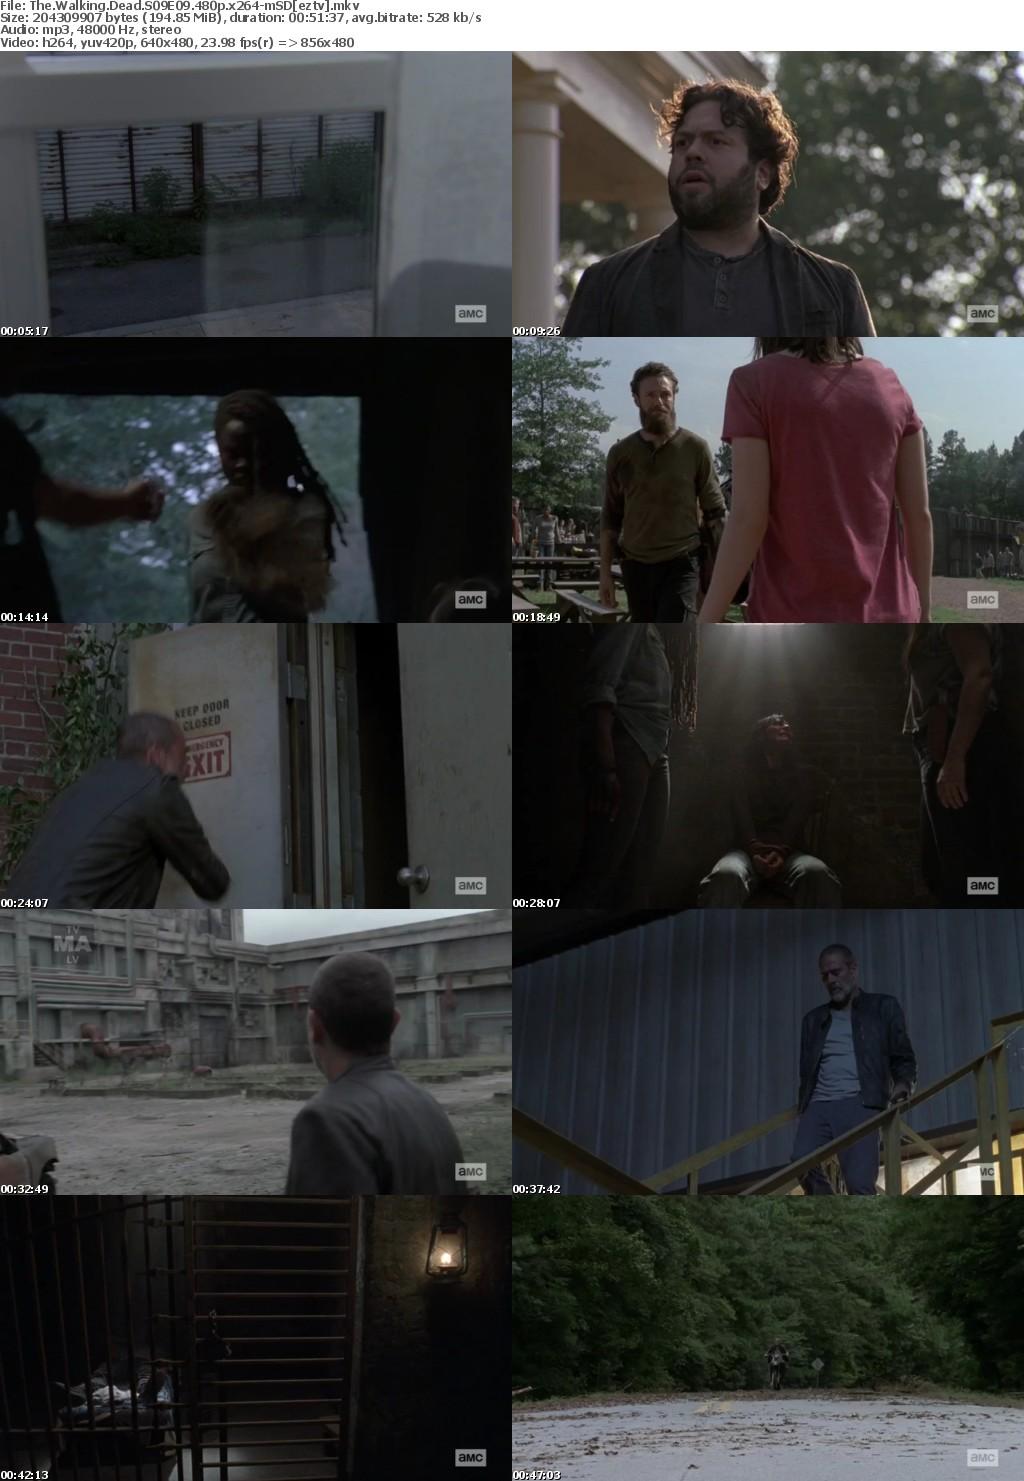 The Walking Dead S09E09 480p x264-mSD